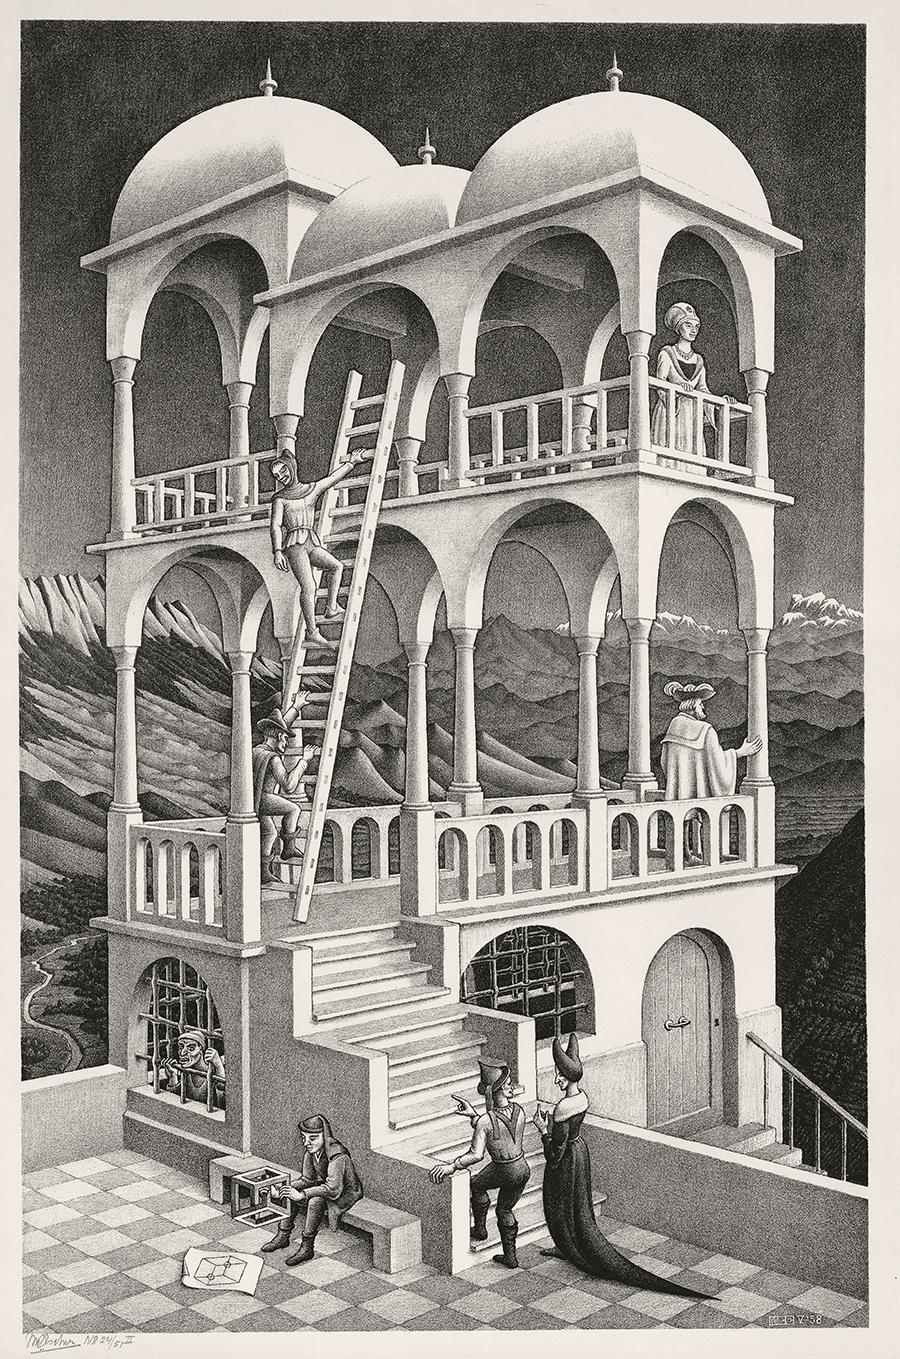 M C Escher S Iconic Illusory Landscapes Come To New York Frieze